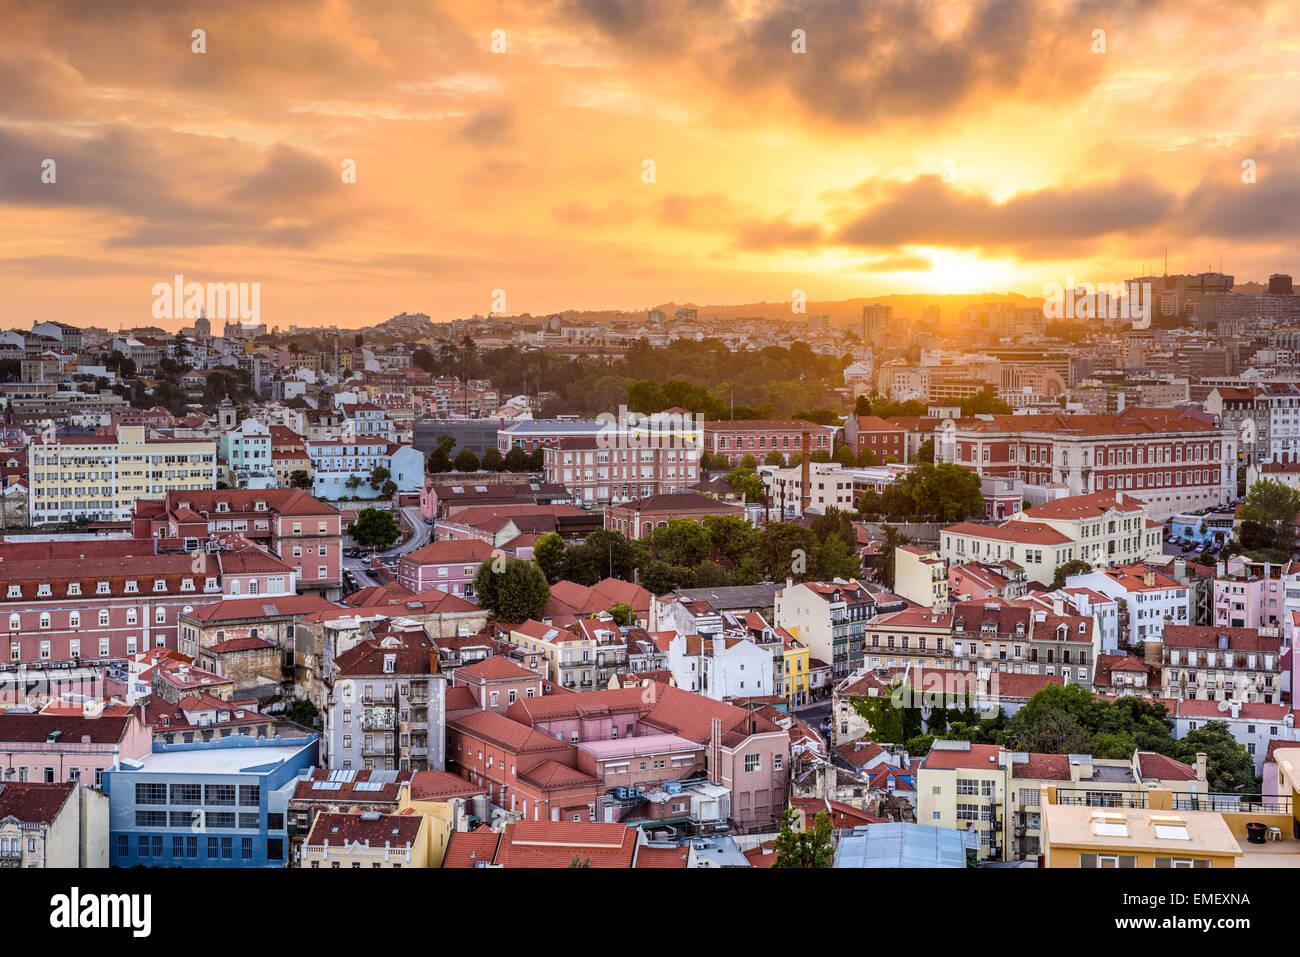 Lissabon, Portugal Stadtbild während des Sonnenuntergangs. Stockbild